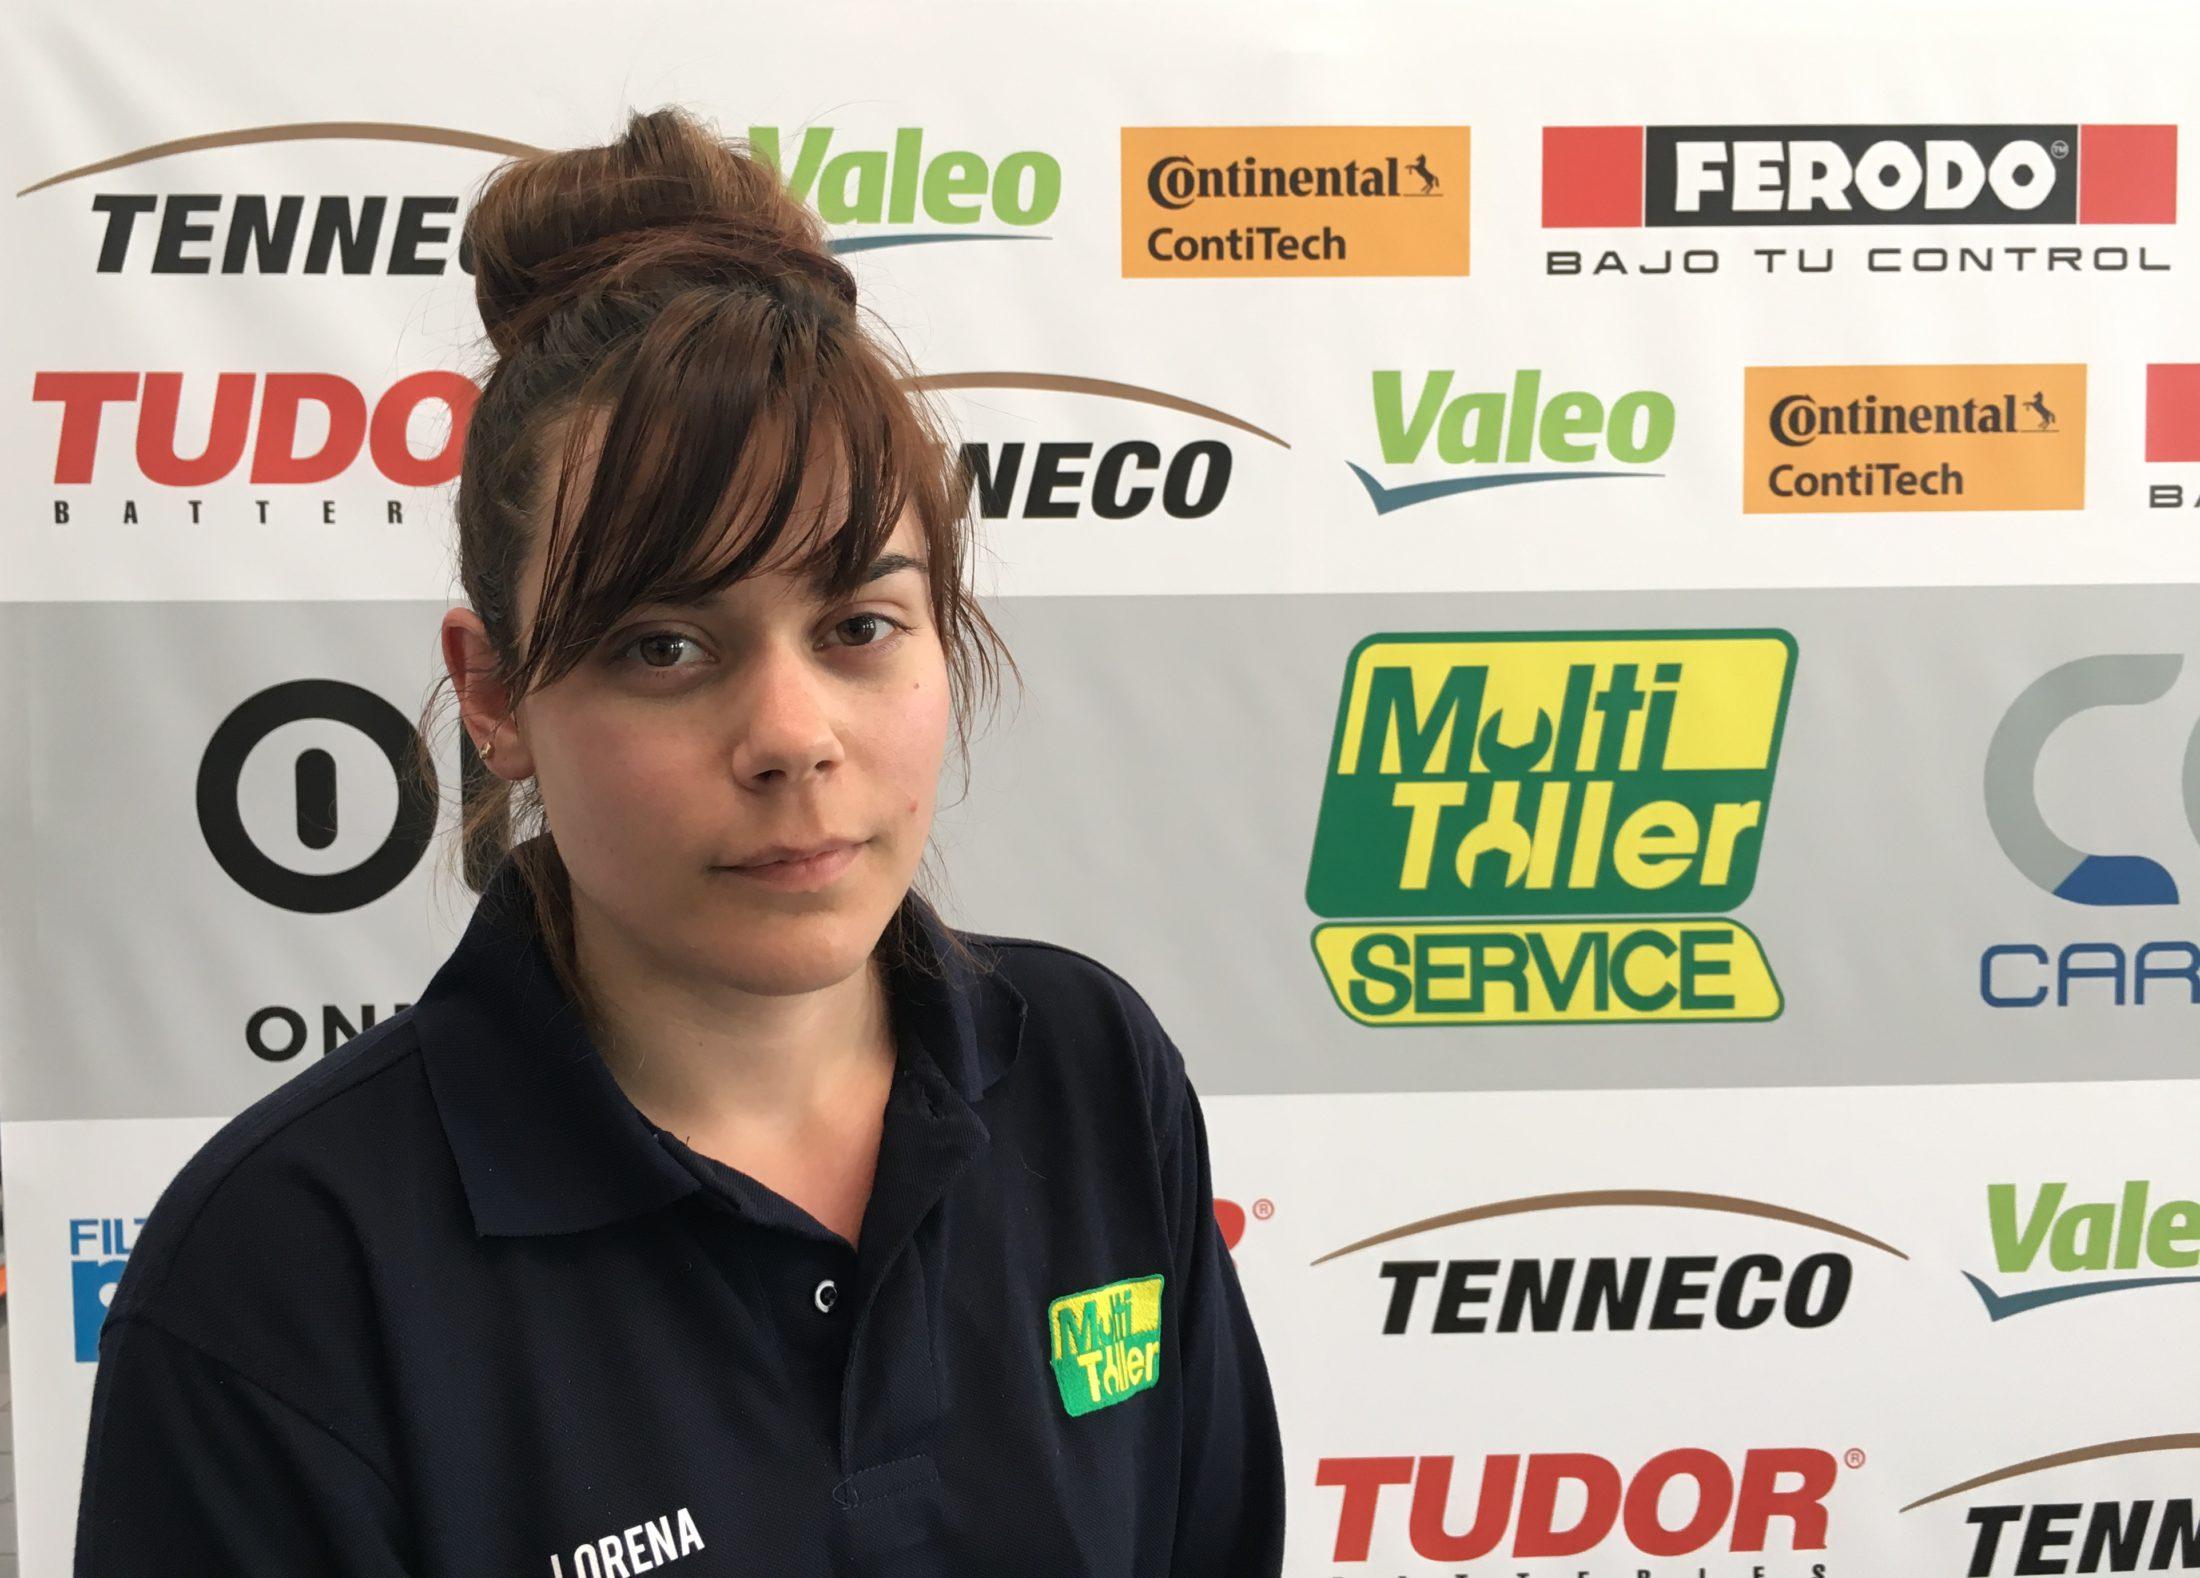 Lorena sueña con ser mecánica de Fórmula 1